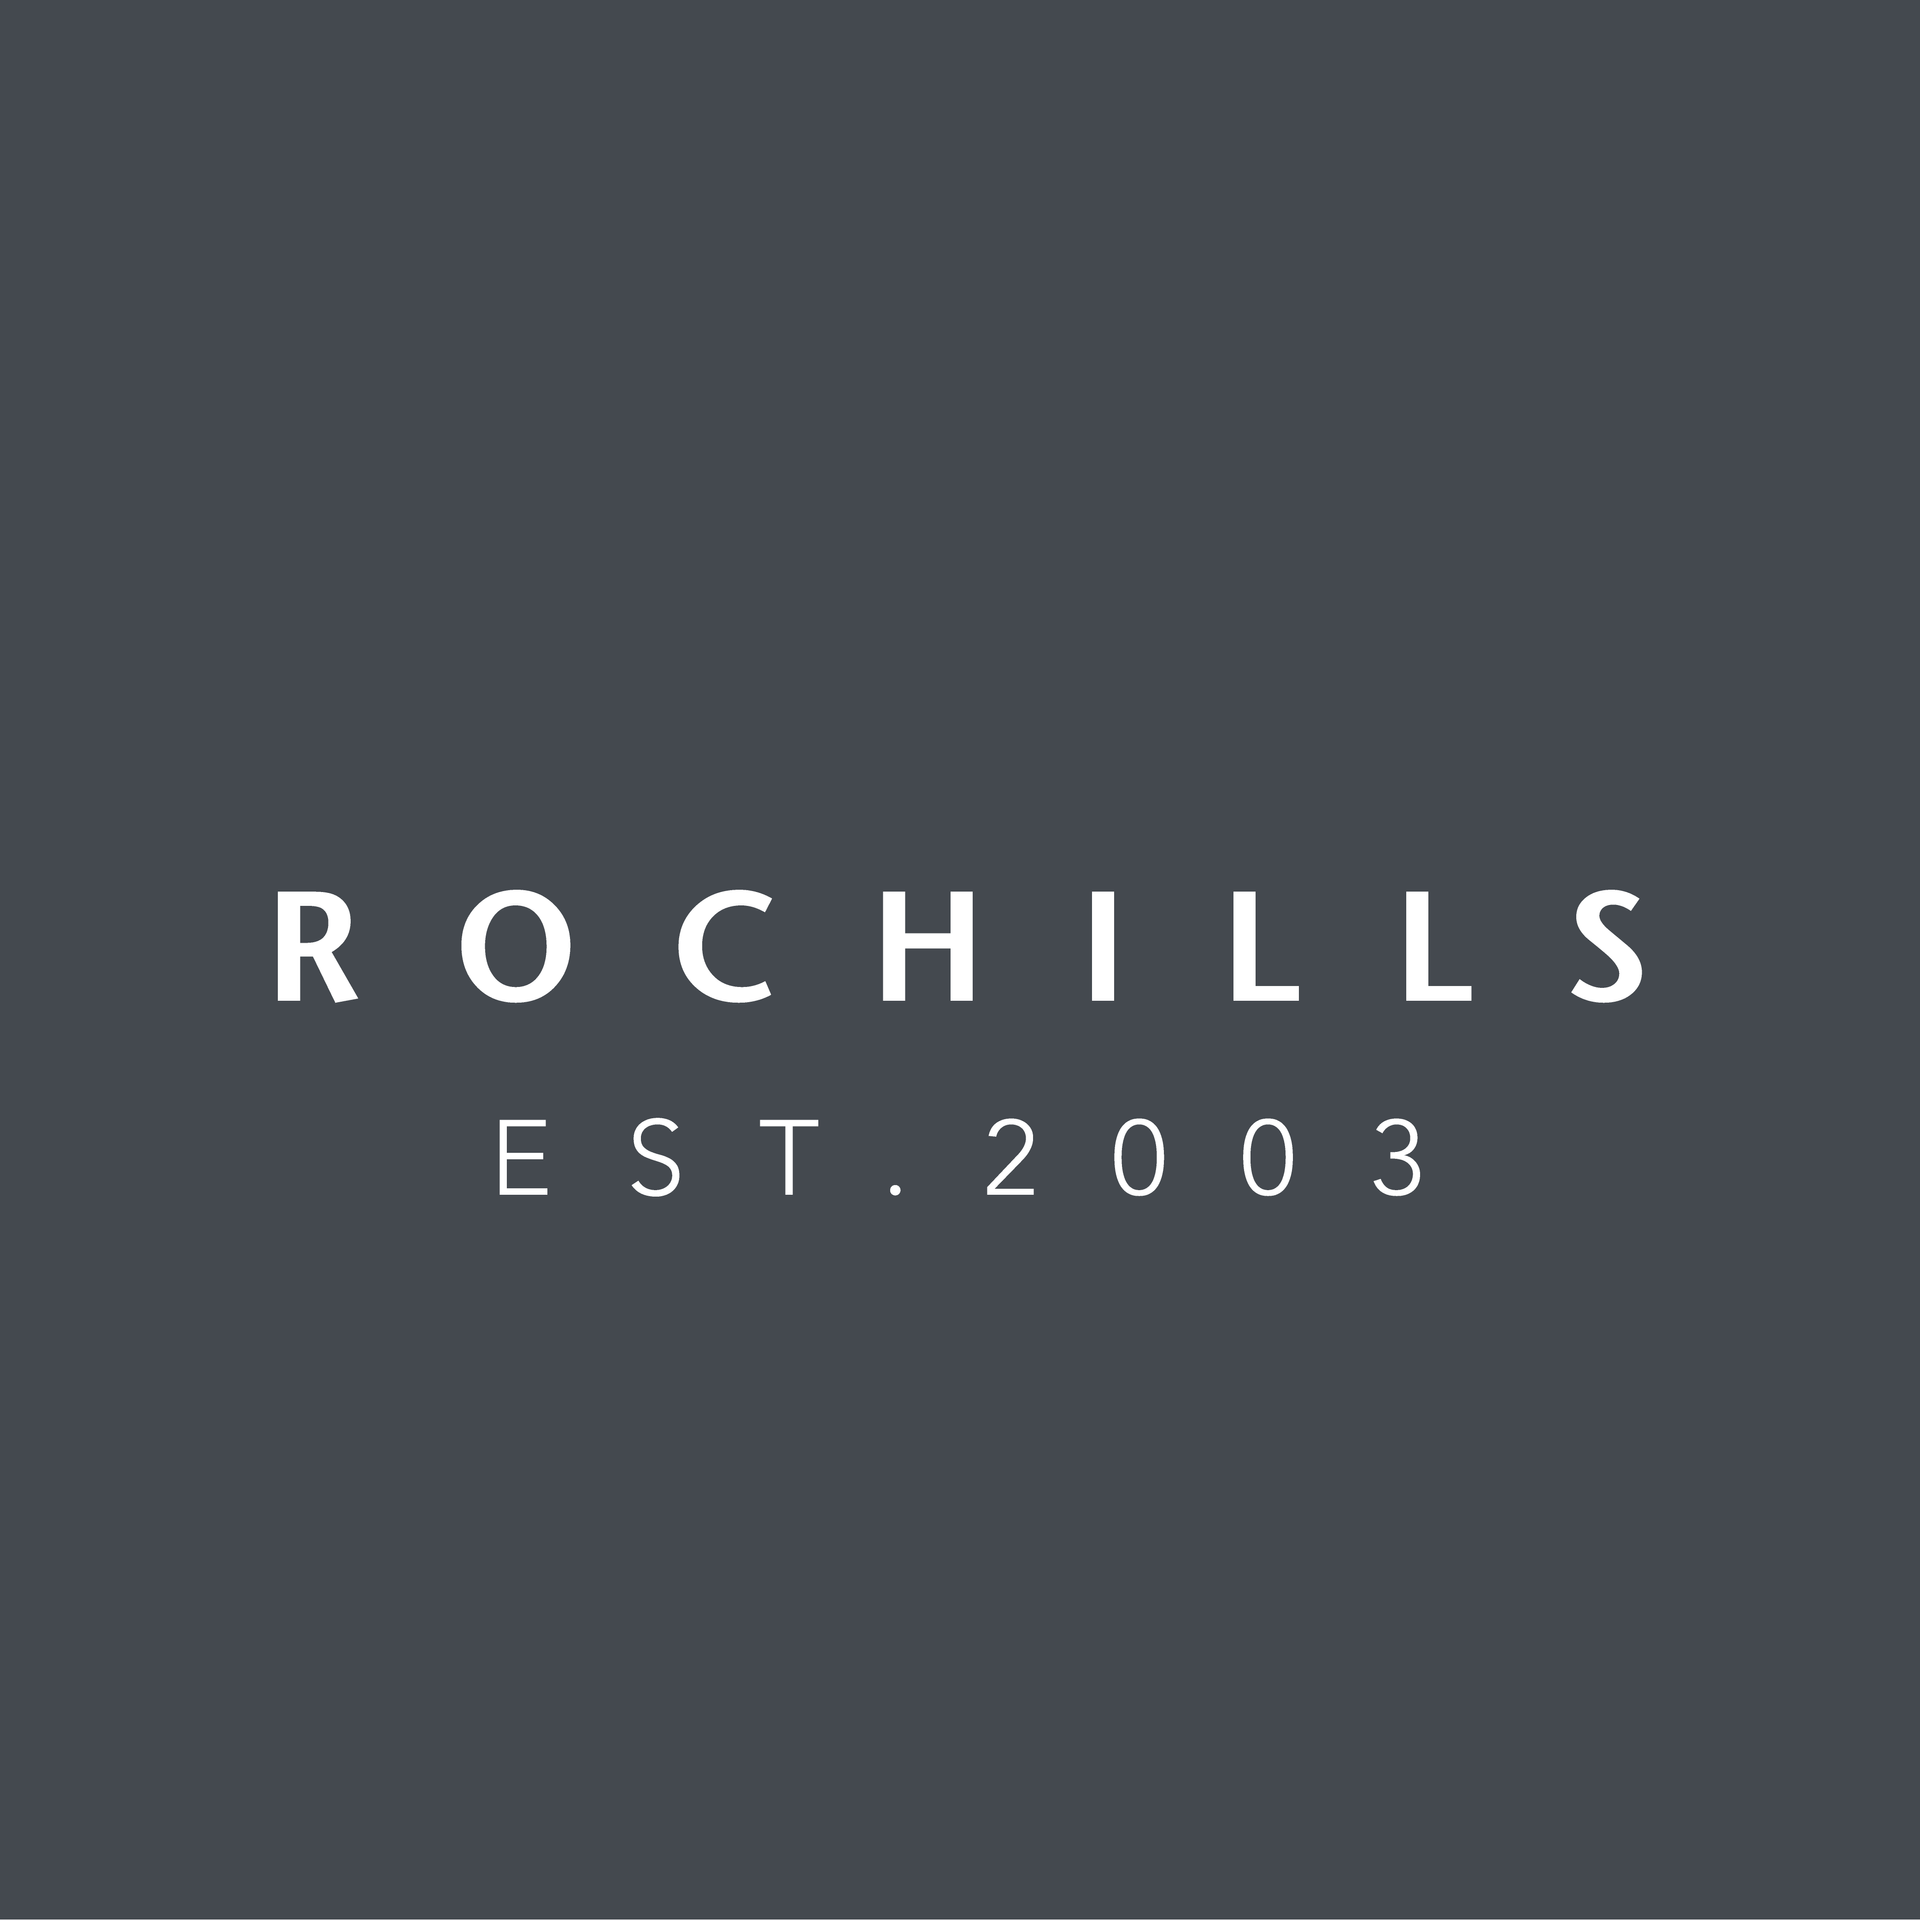 Rochills Estate Agency Branding | Brand Identity Design by Fresh Leaf Creative | Dorset Brand Designer & Photographer